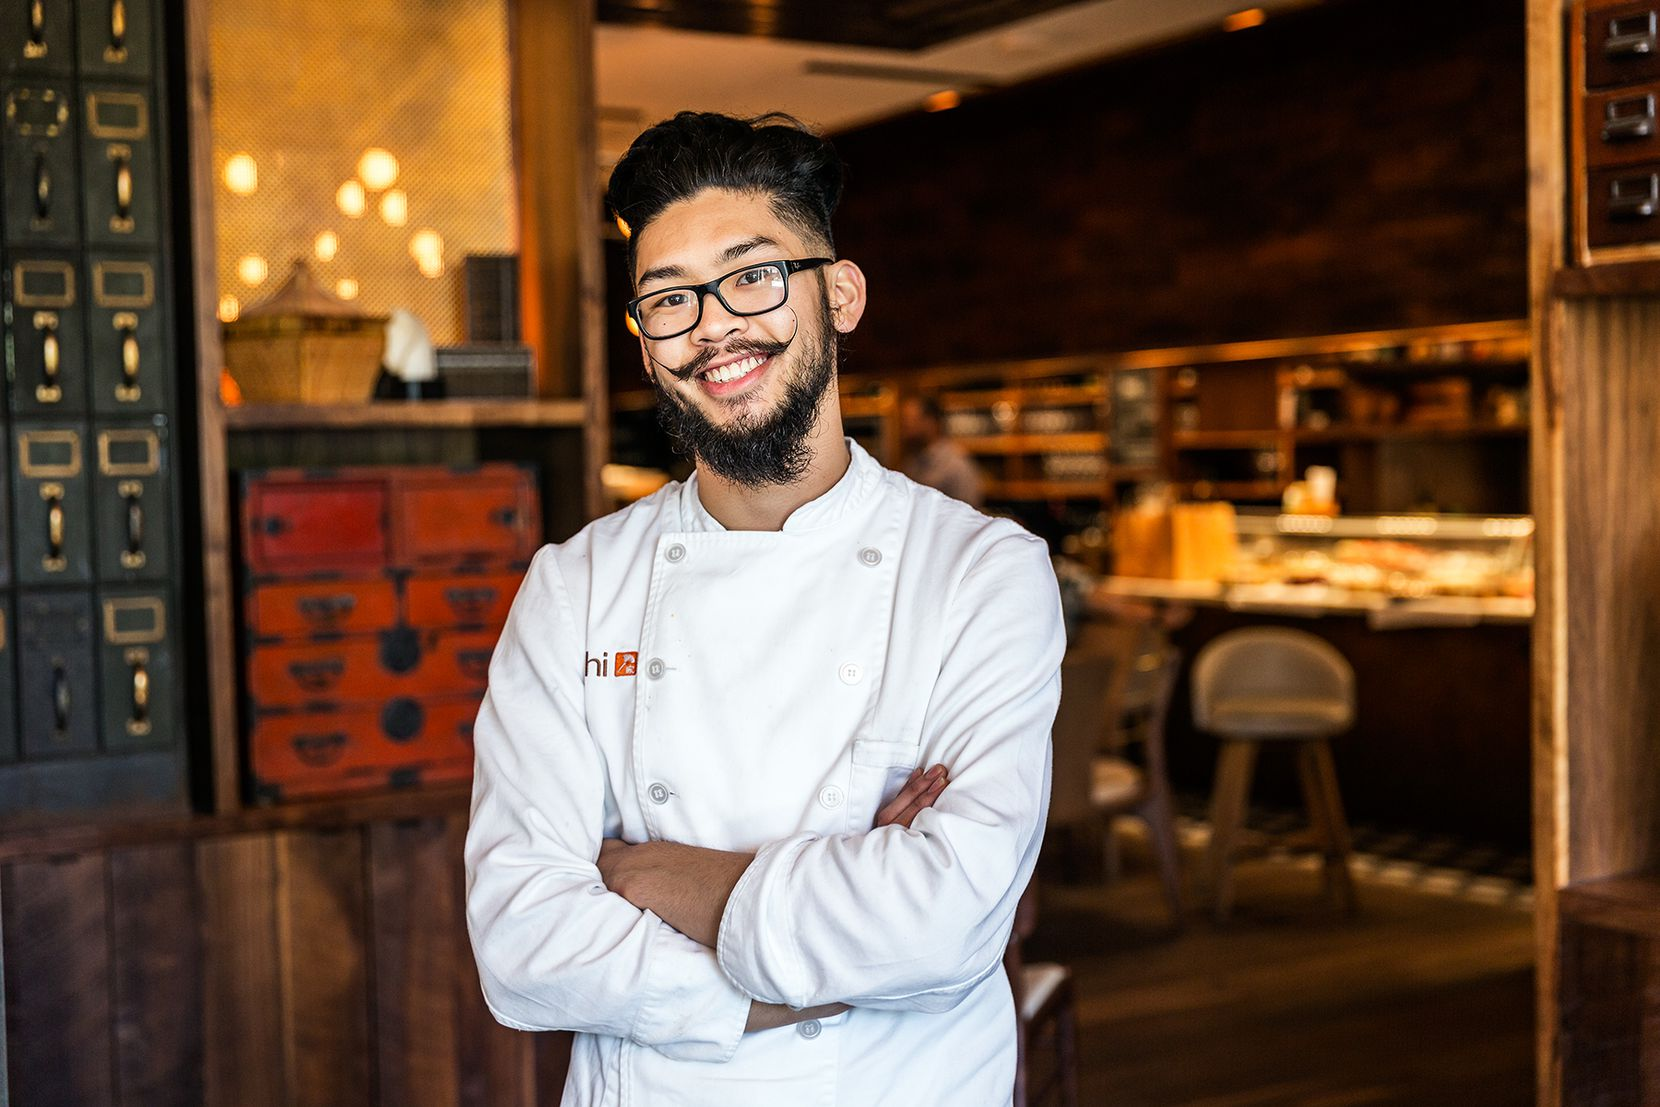 Calvin Pravongviengkham, 23, cook at Uchi